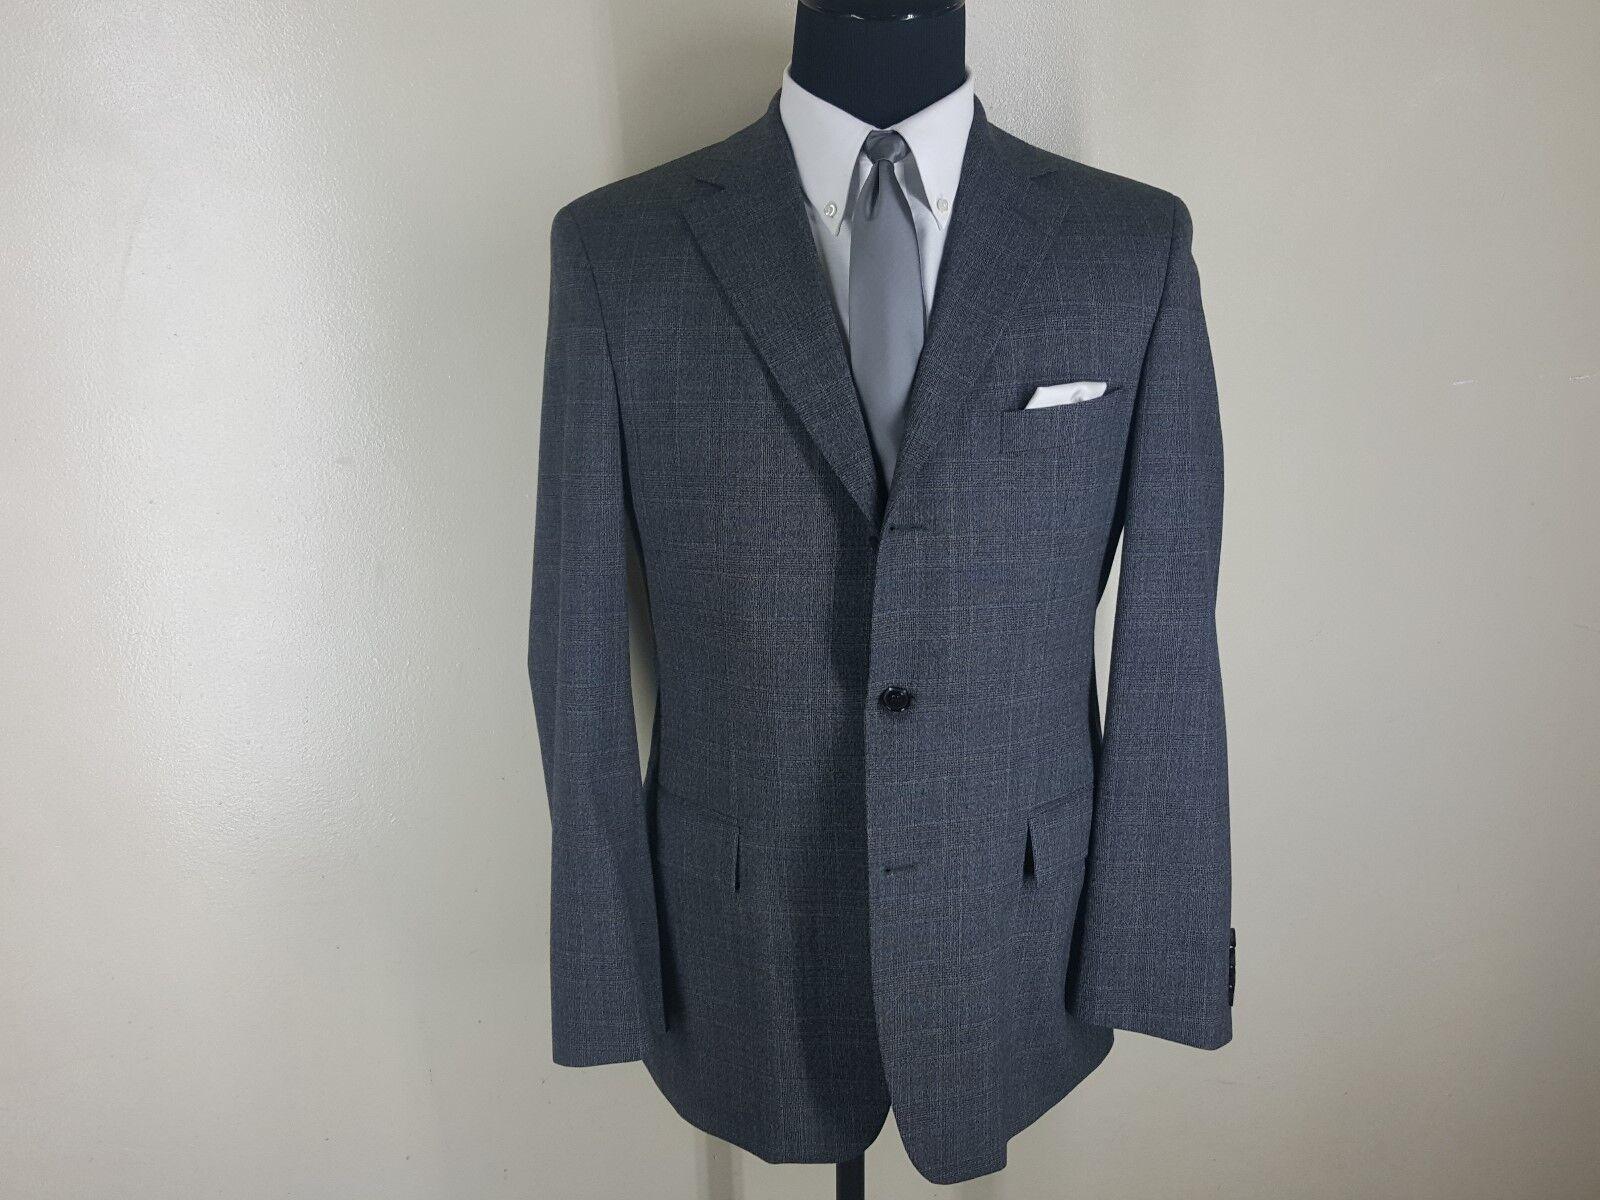 HUGO BOSS Made In USA Sport Coat 3 Btn Side Vents Wool Blend  40R- Fit 40-42 Reg